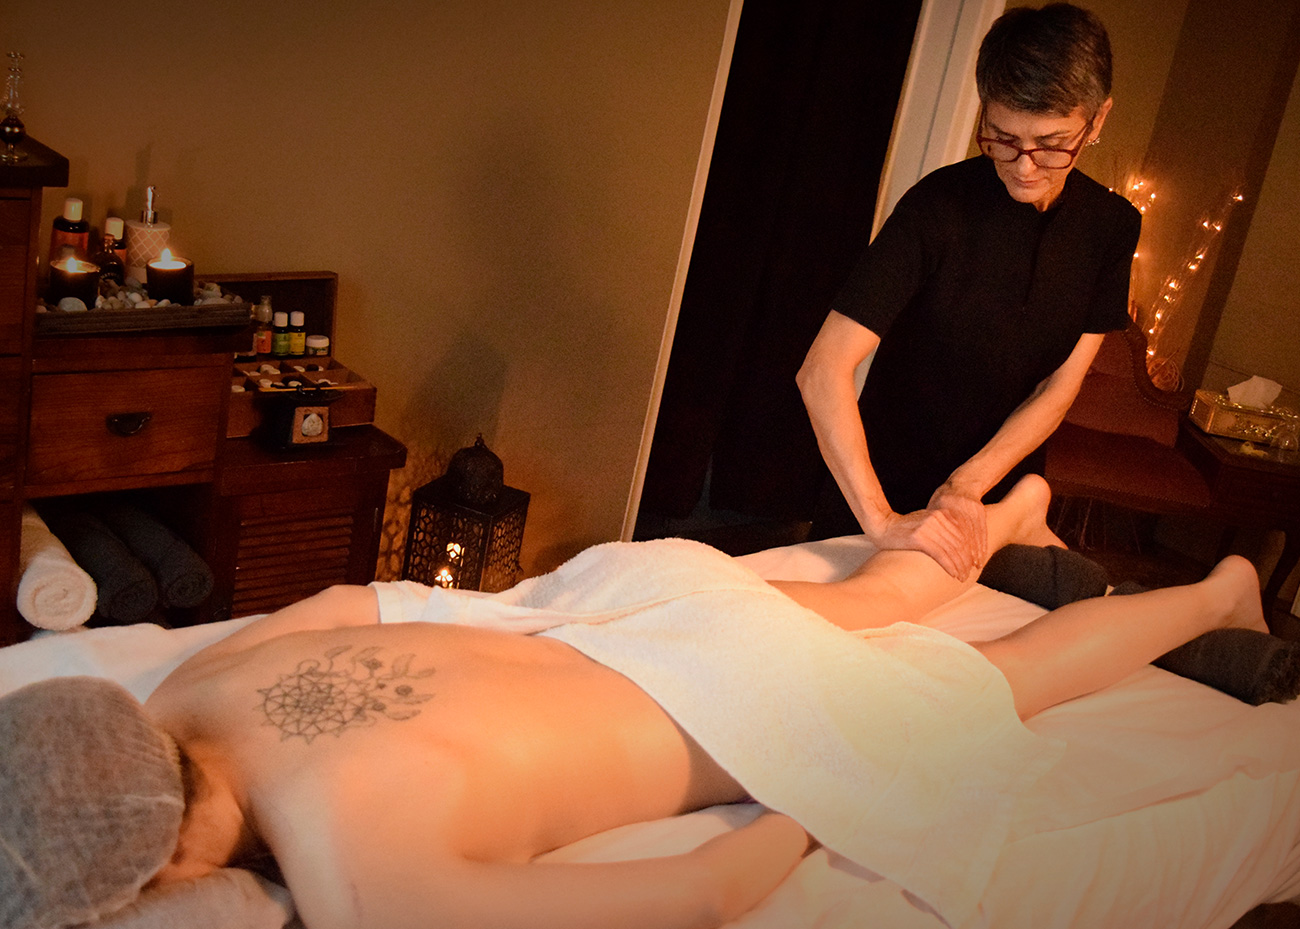 Femme fait massage. Institut de Beauté Terra Lucentum